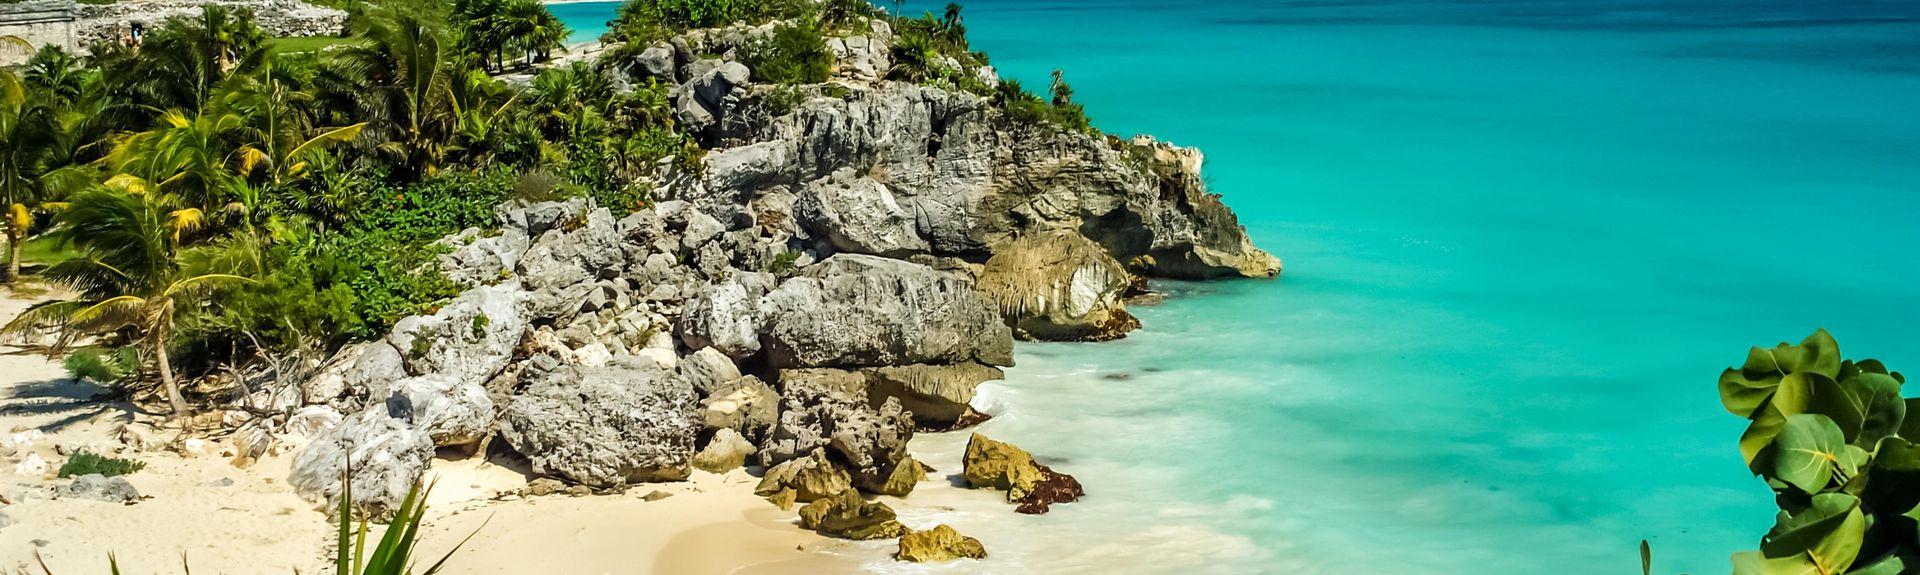 Zazil-ha, Playa del Carmen, Quintana Roo, Mexiko